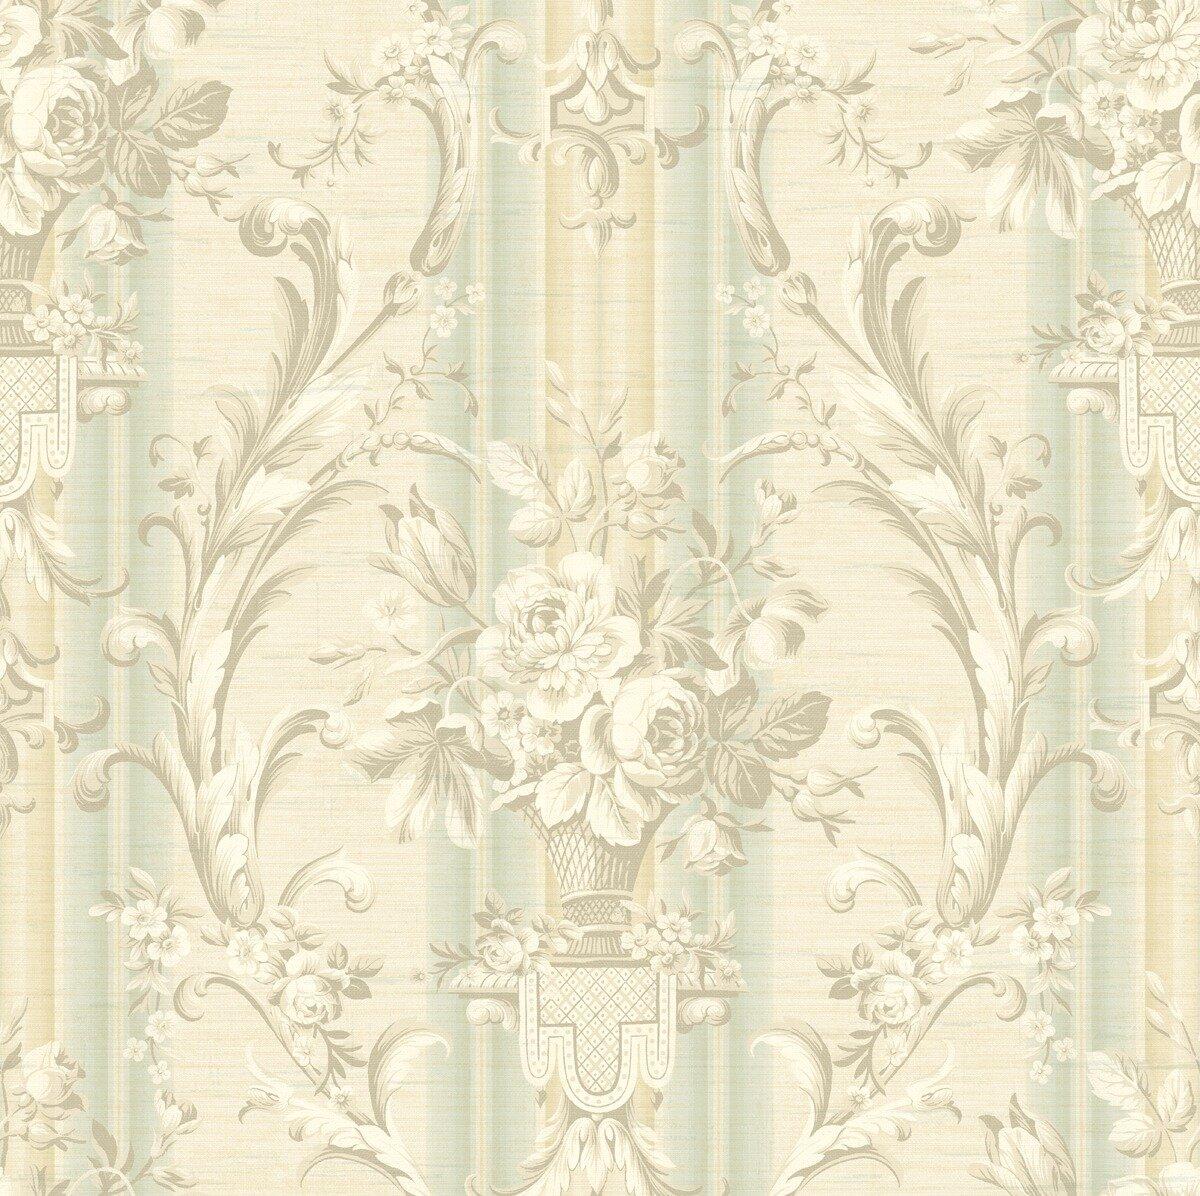 House Of Hampton Swanigan Wiltshire Floral Stripe 33 L X 20 5 W